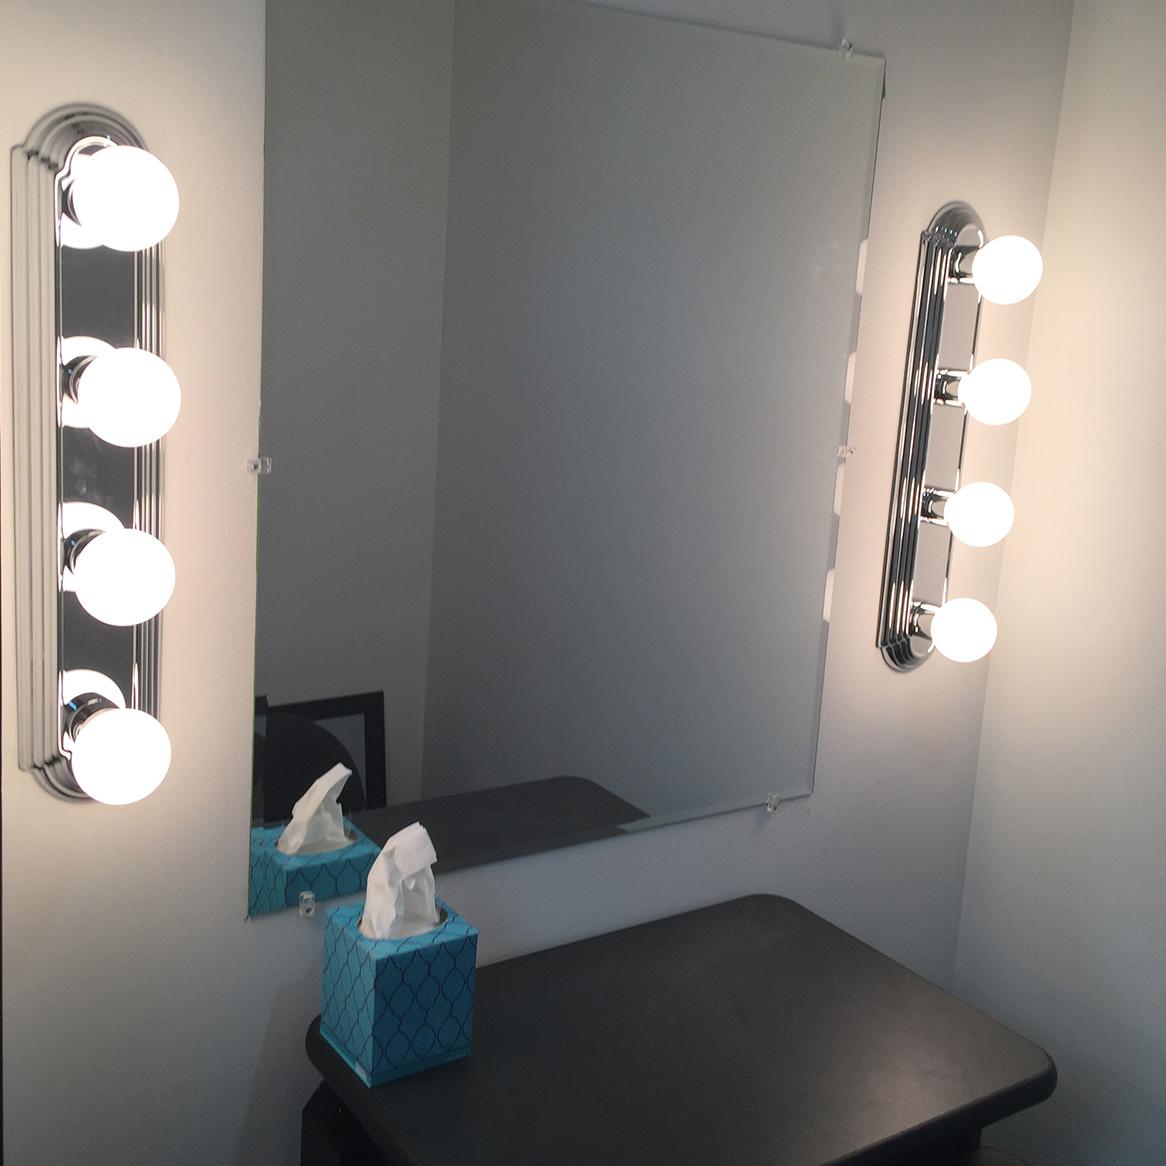 Small wardrobe / make-up area